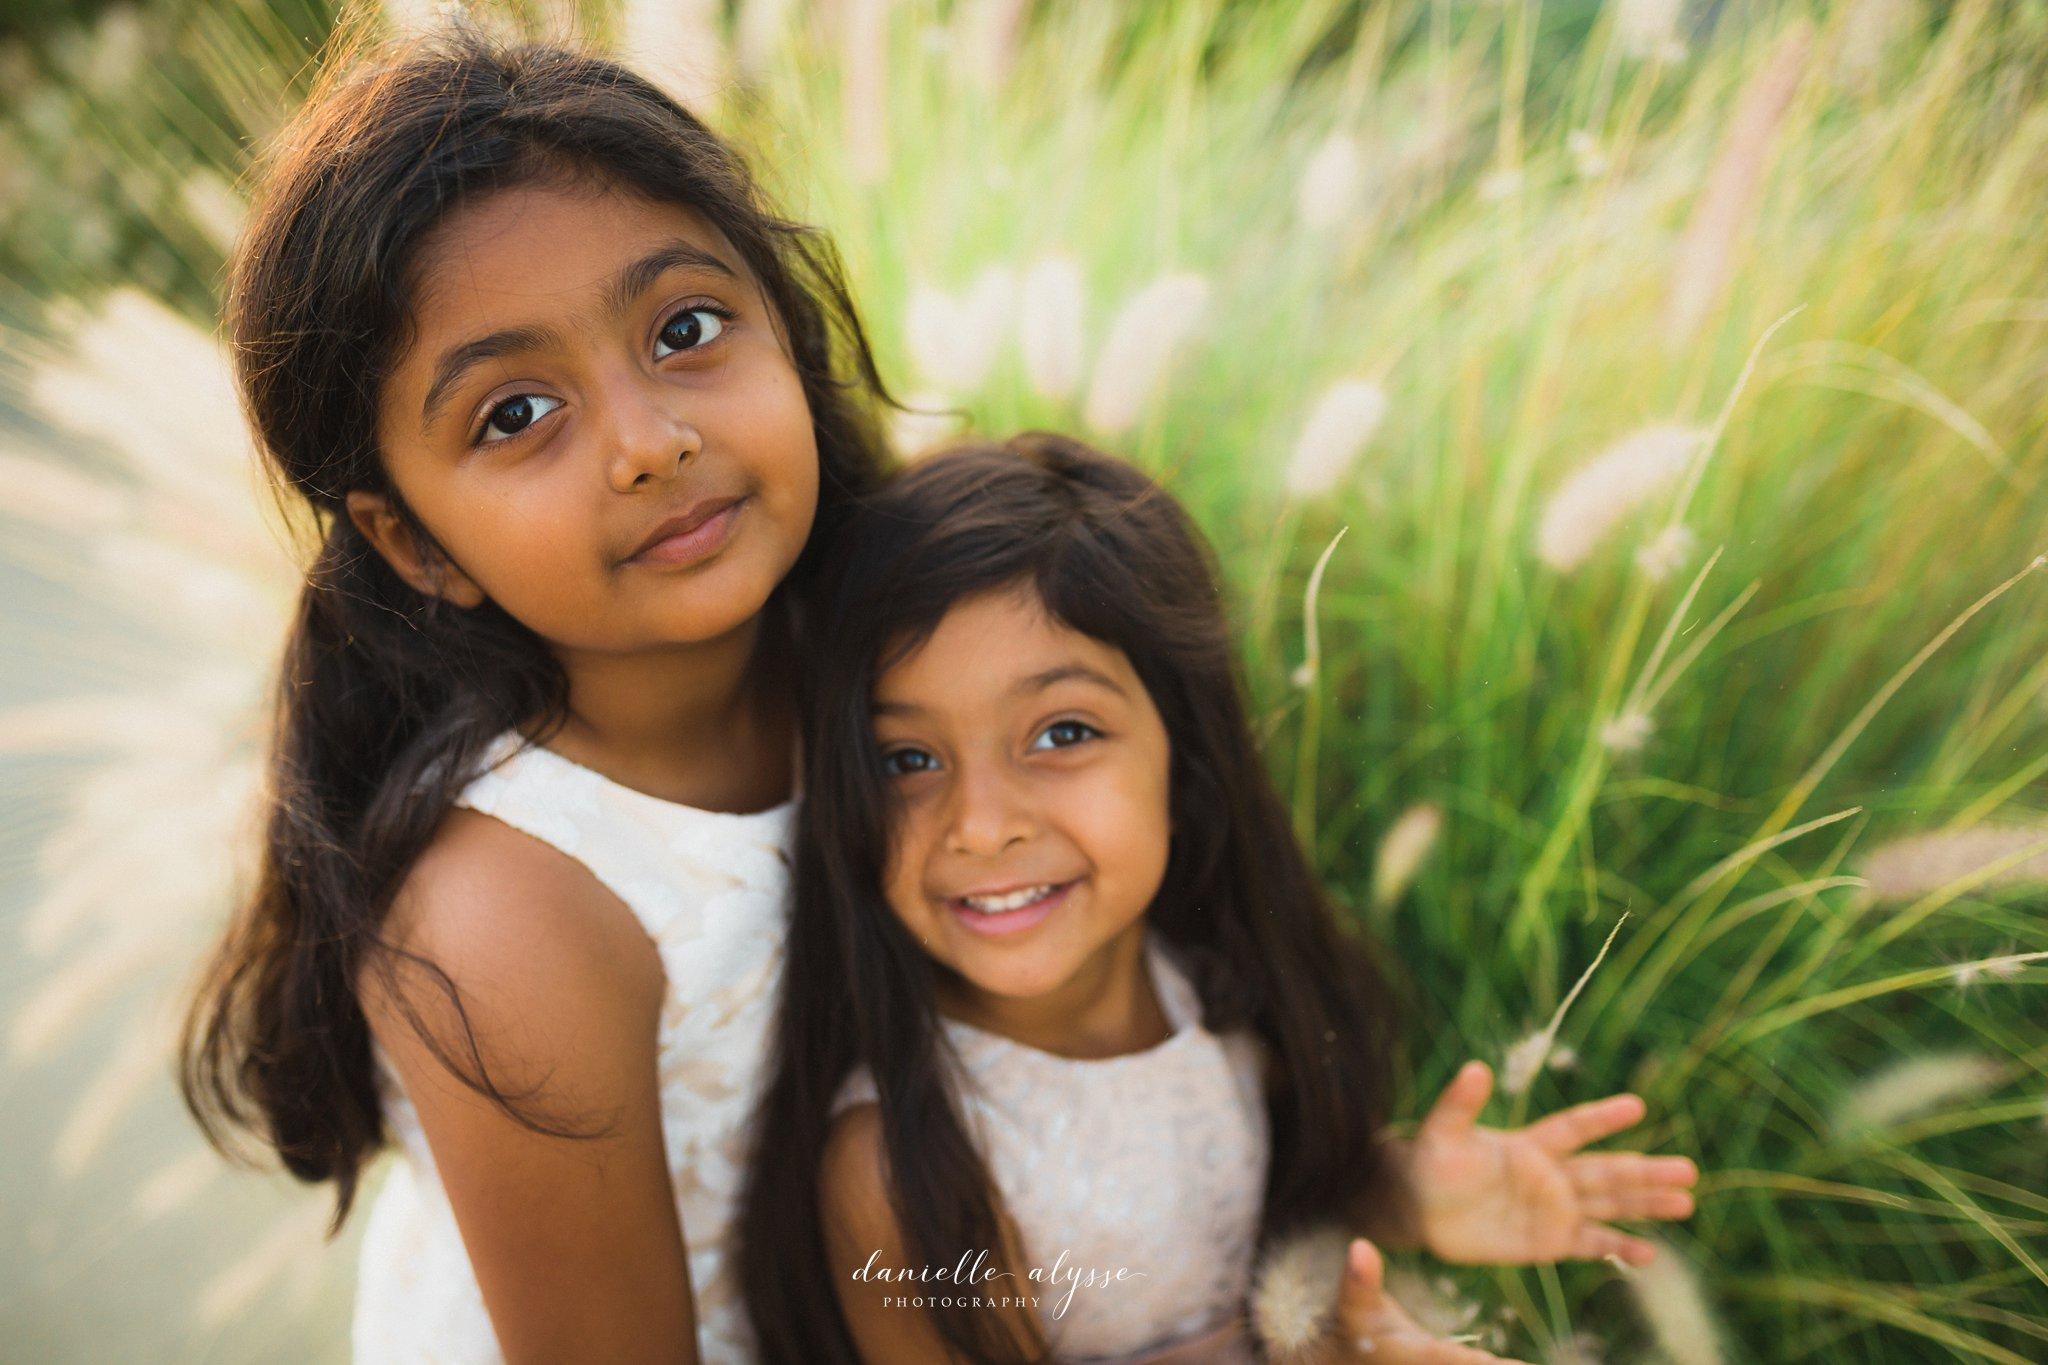 180628_family_portrait_navjit_folsom_california_danielle_alysse_photography_blog_46_WEB.jpg